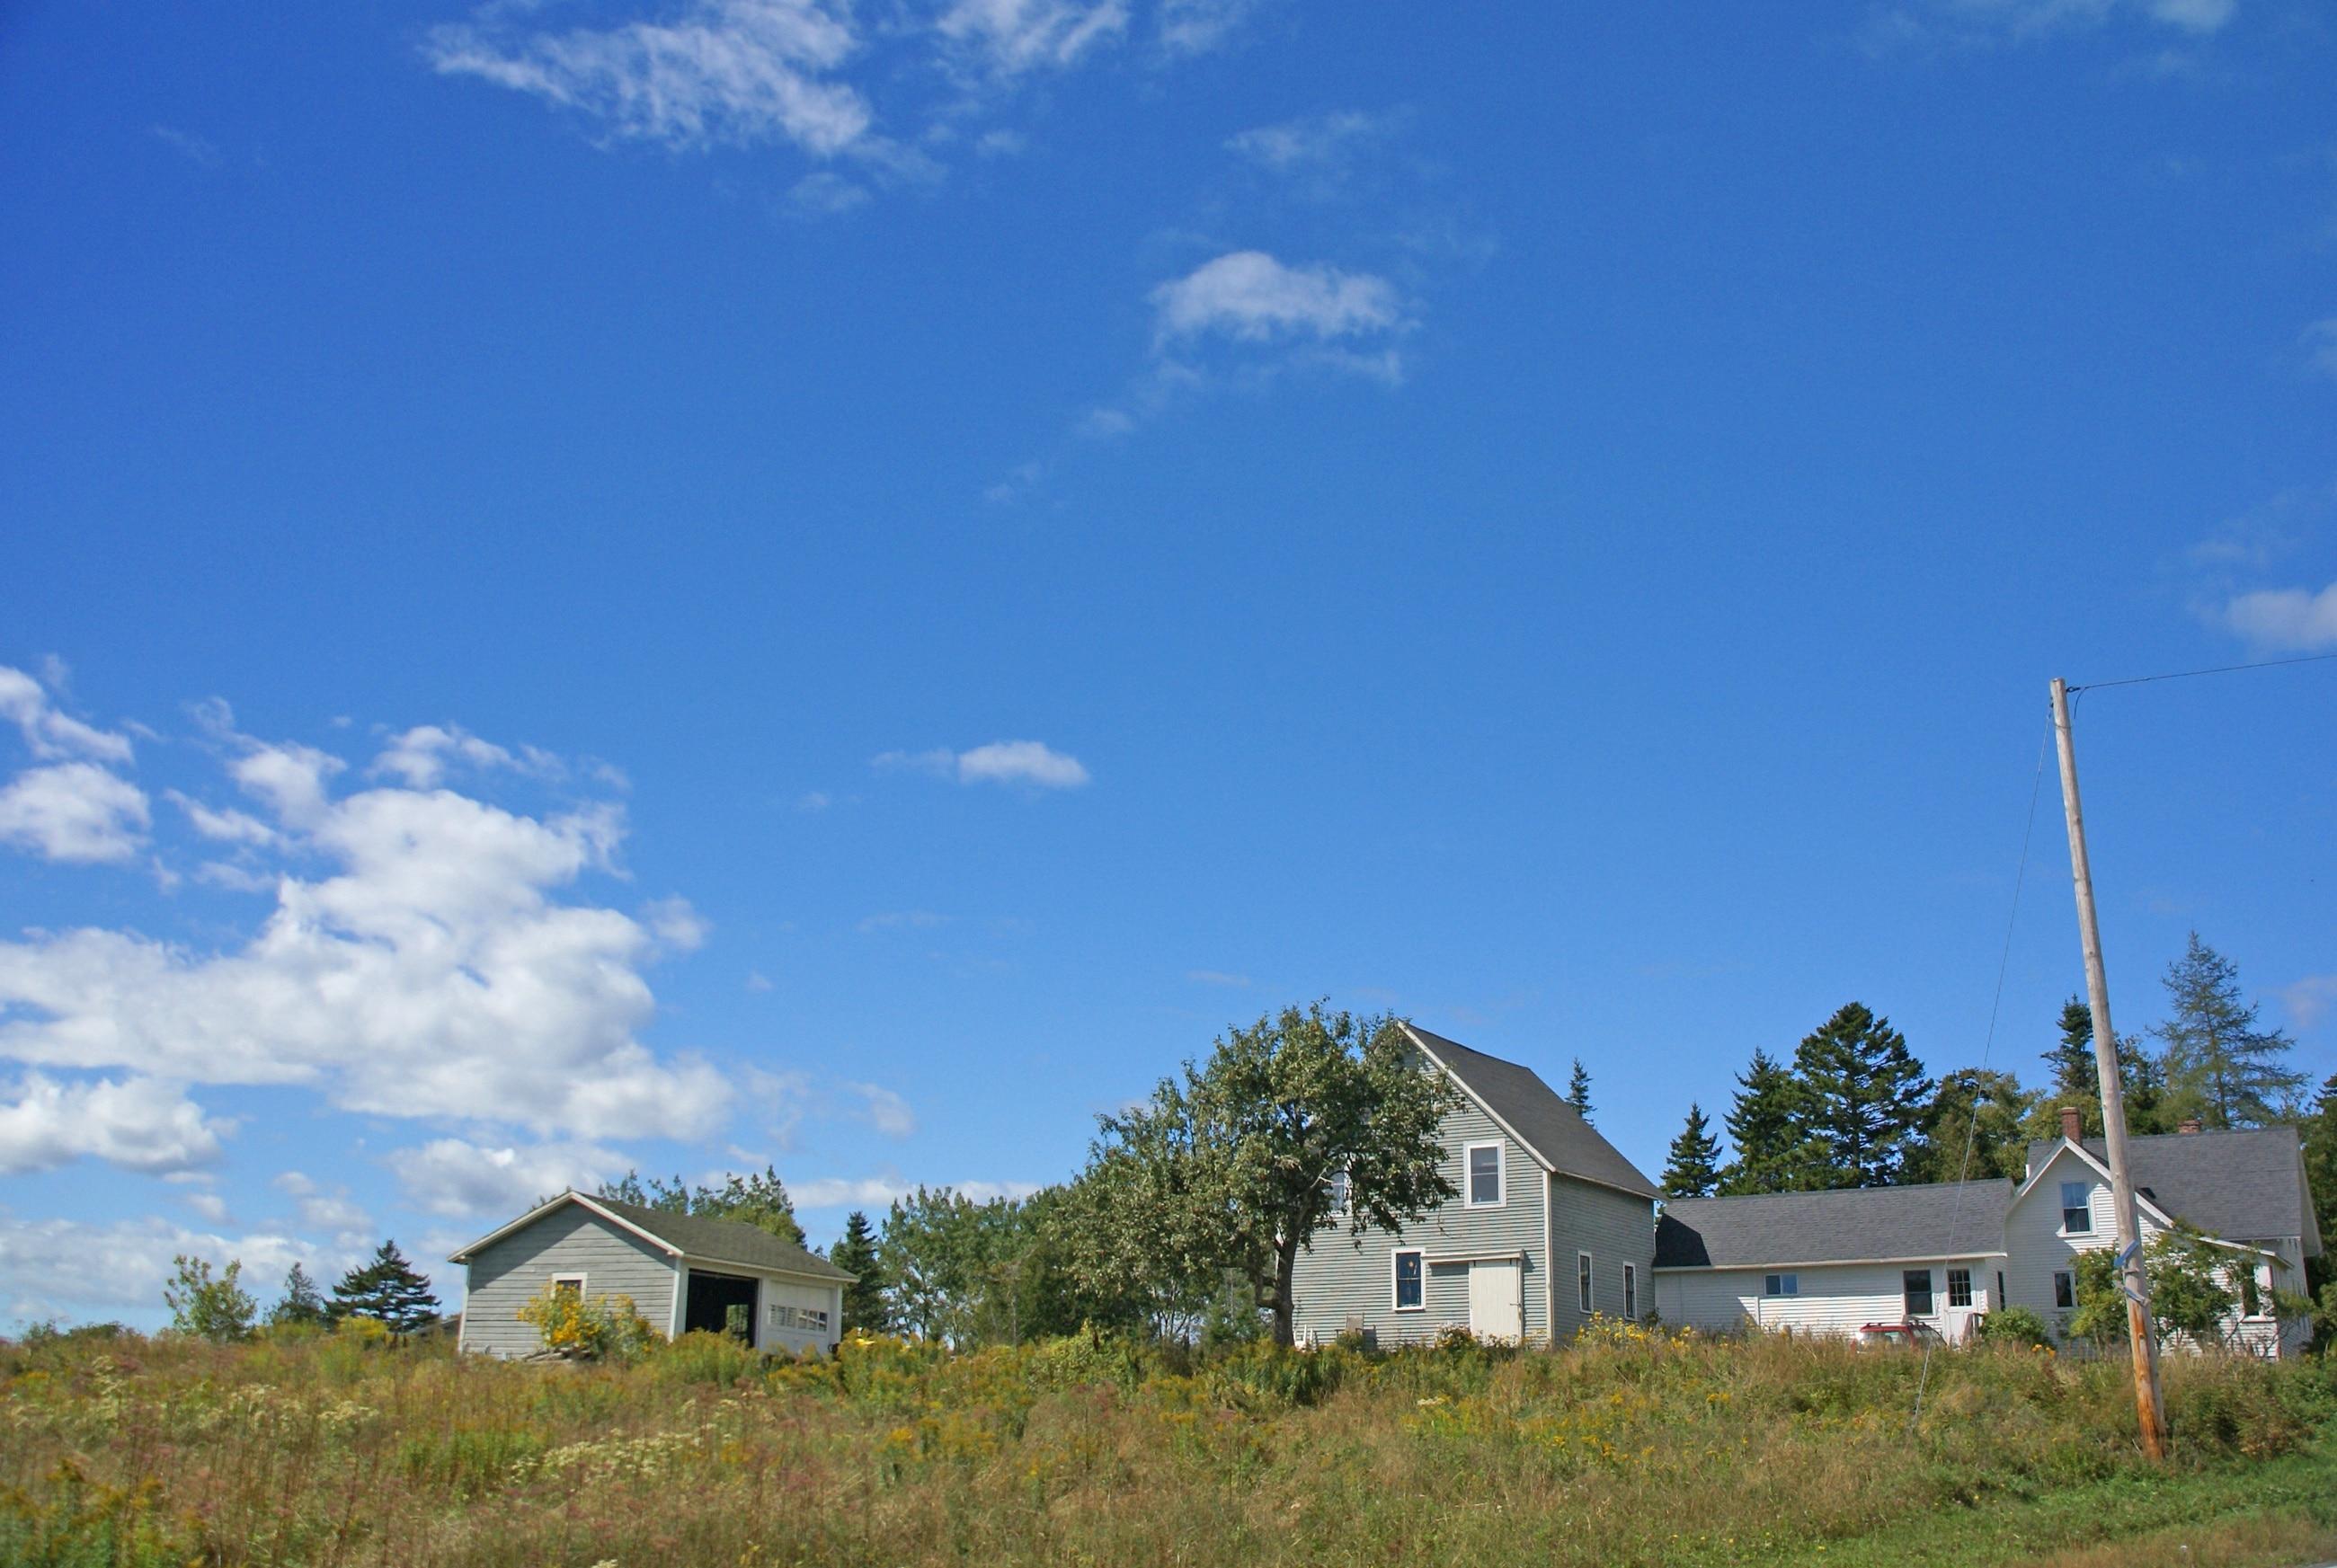 Acadia National Park, Bar Harbor, Maine, United States of America